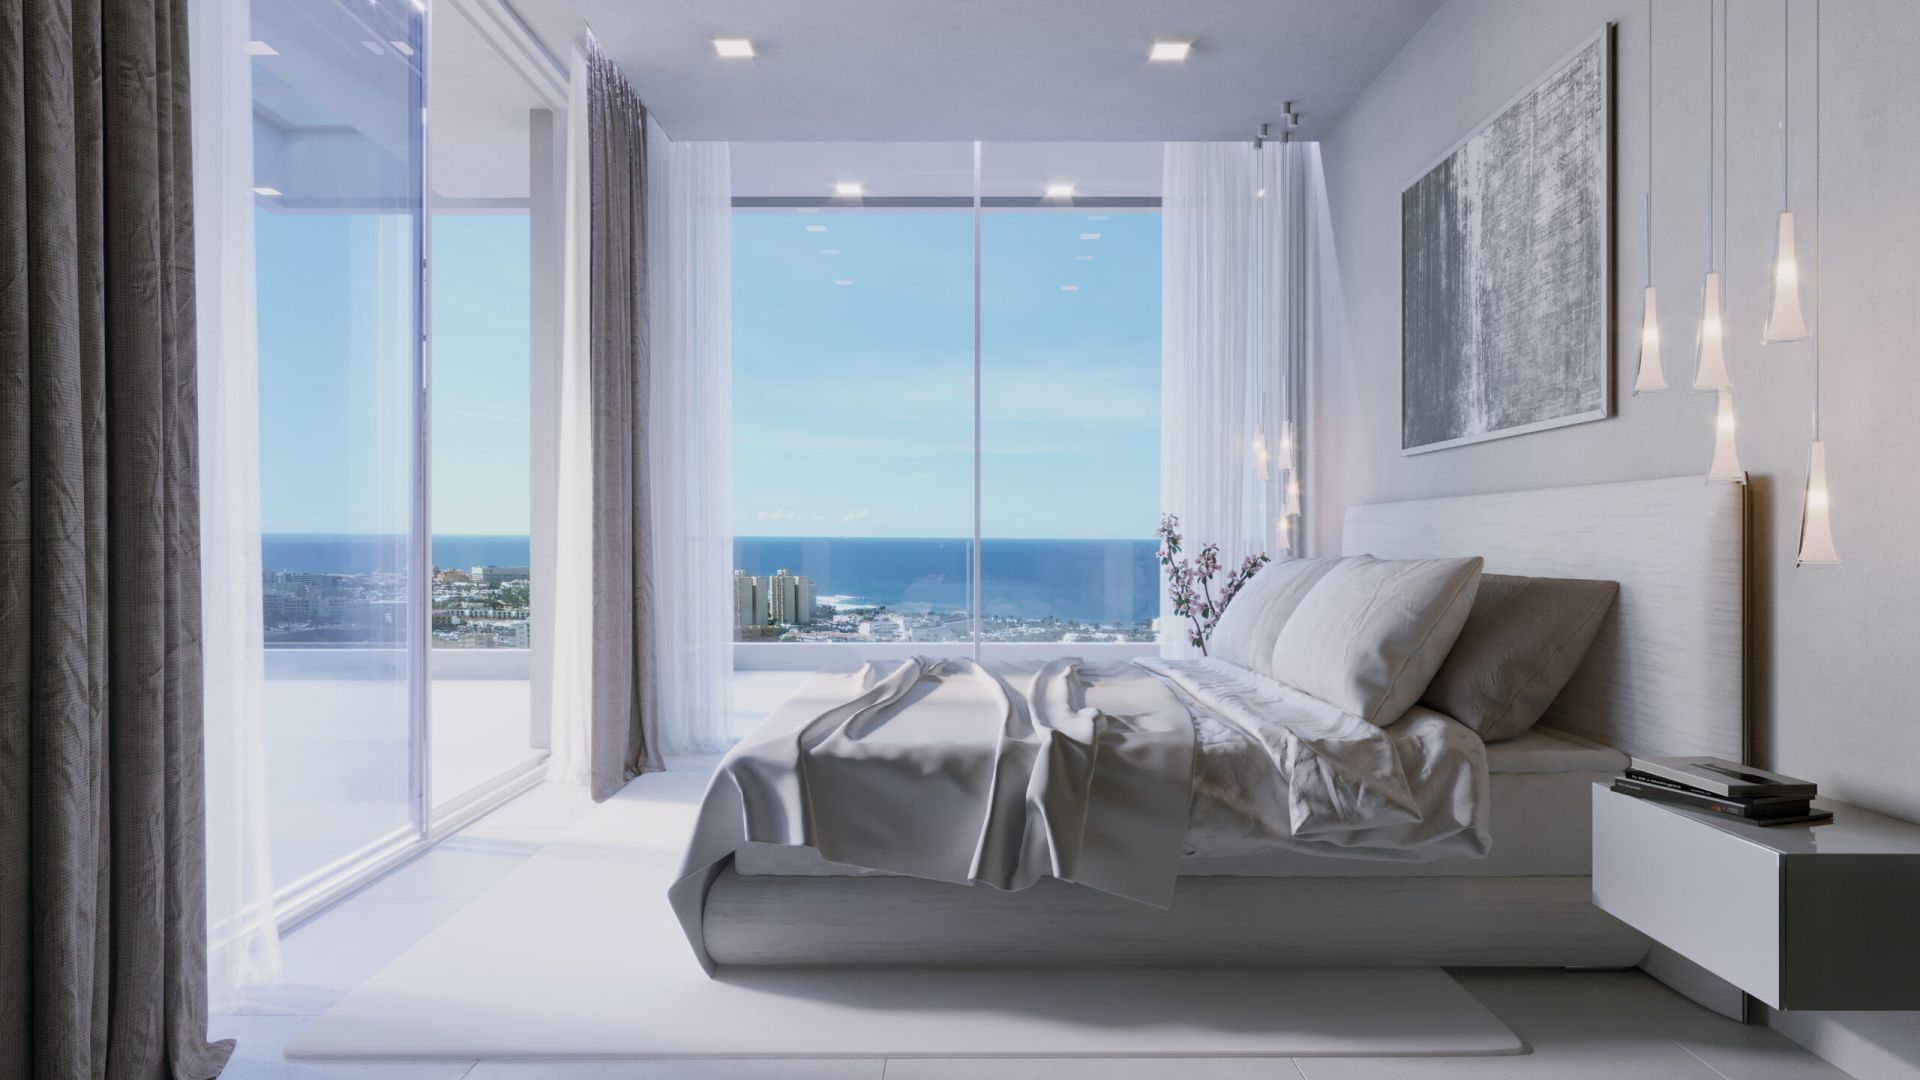 Serenity Luxury Villas Tenerife - img 8.